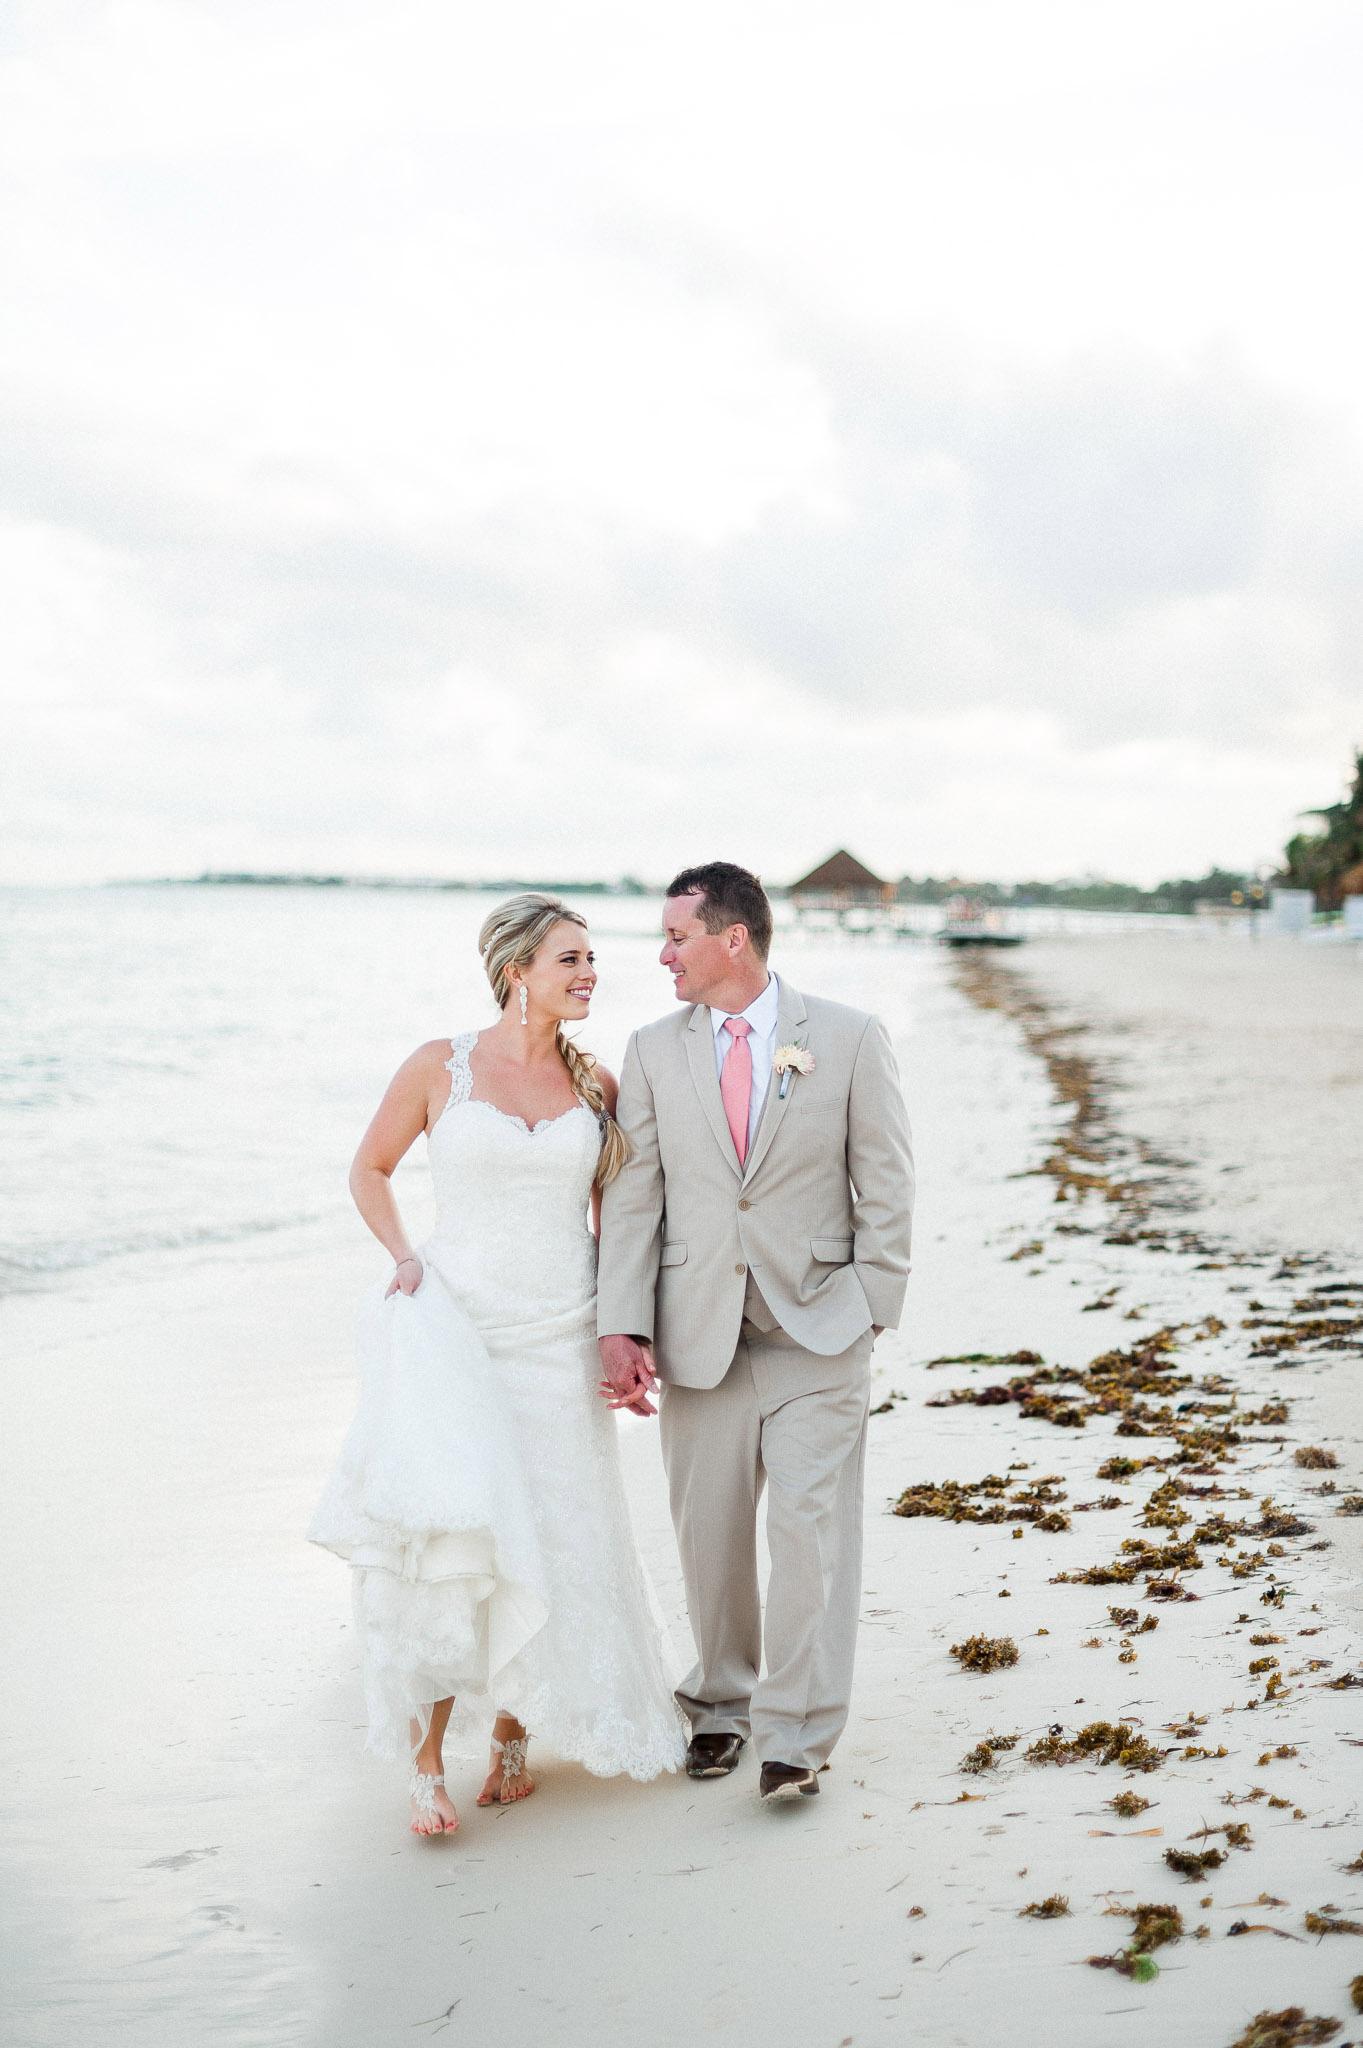 Megan and Chris wedding-49.jpg